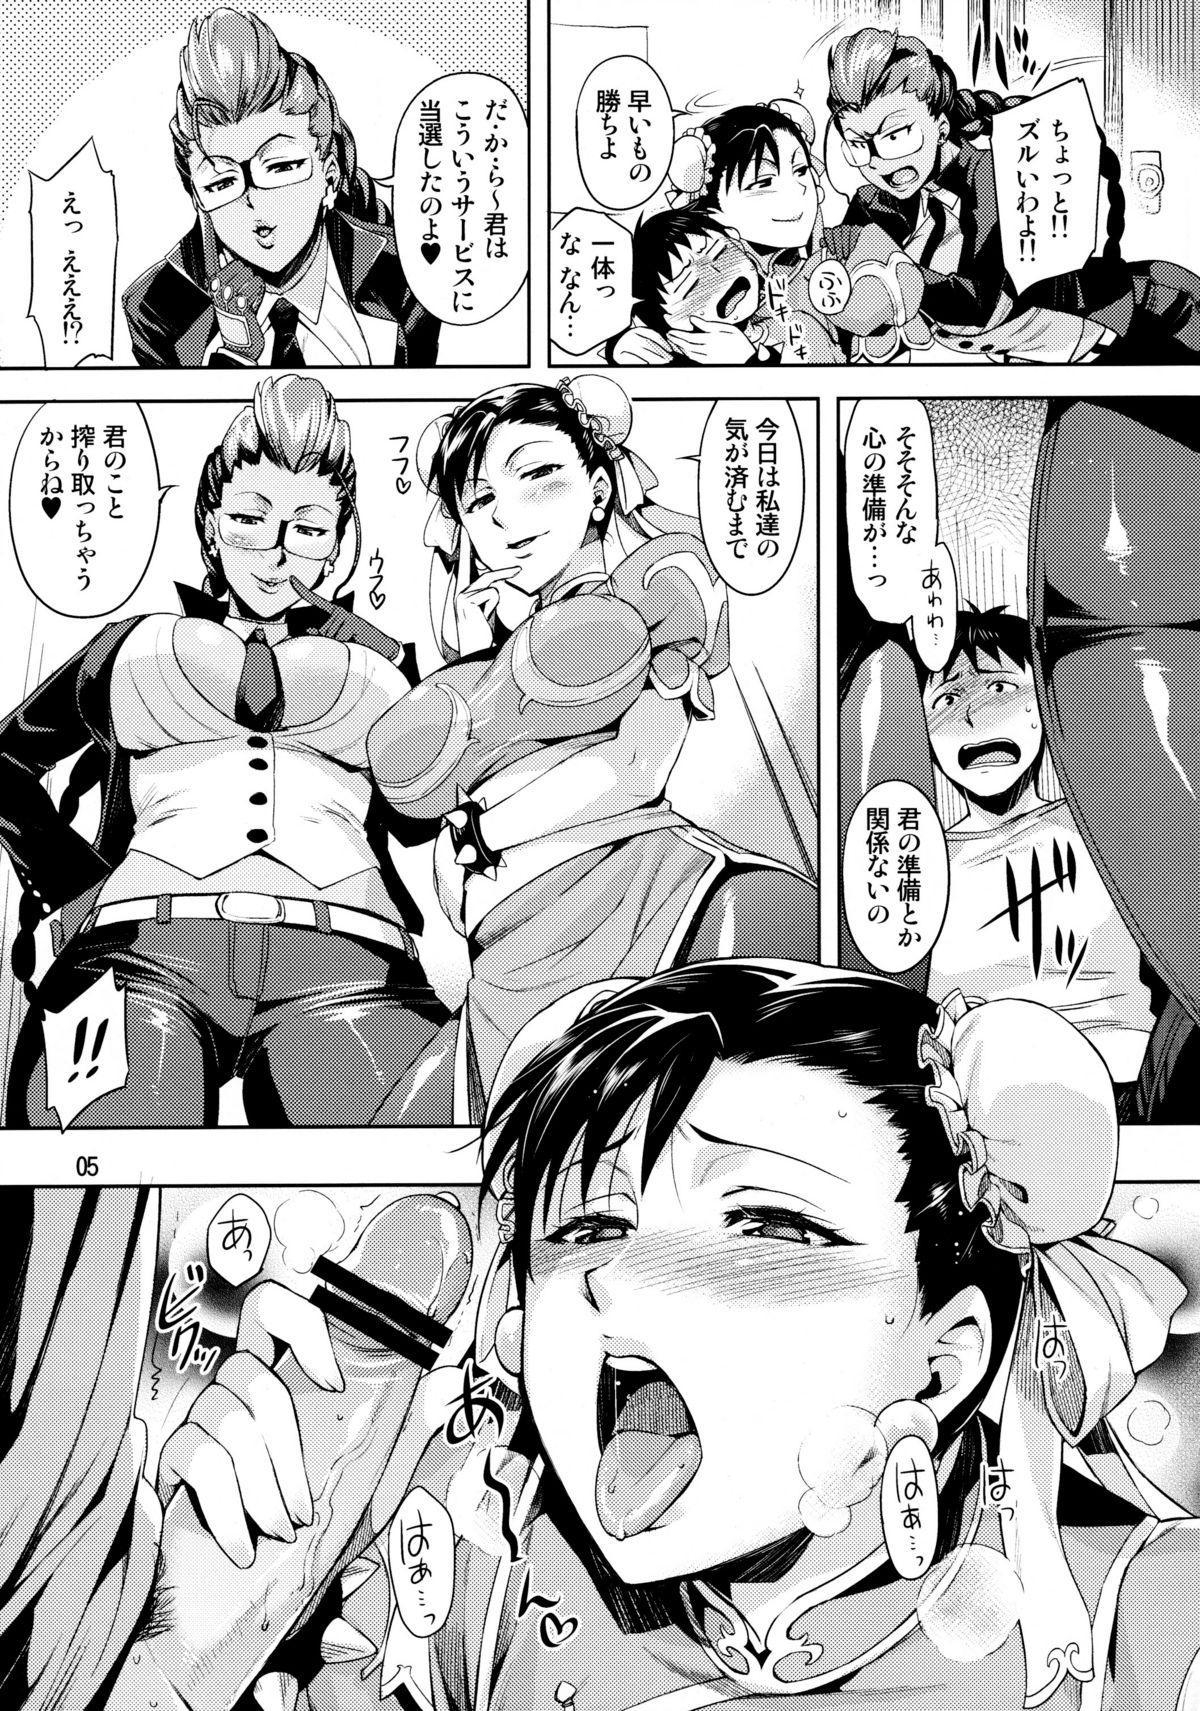 (COMIC1☆5) [ReDrop (Miyamoto Smoke, Otsumami)] Haru no Chun-Li Bon   The Chun-Li Spring Book (Street Fighter) 3